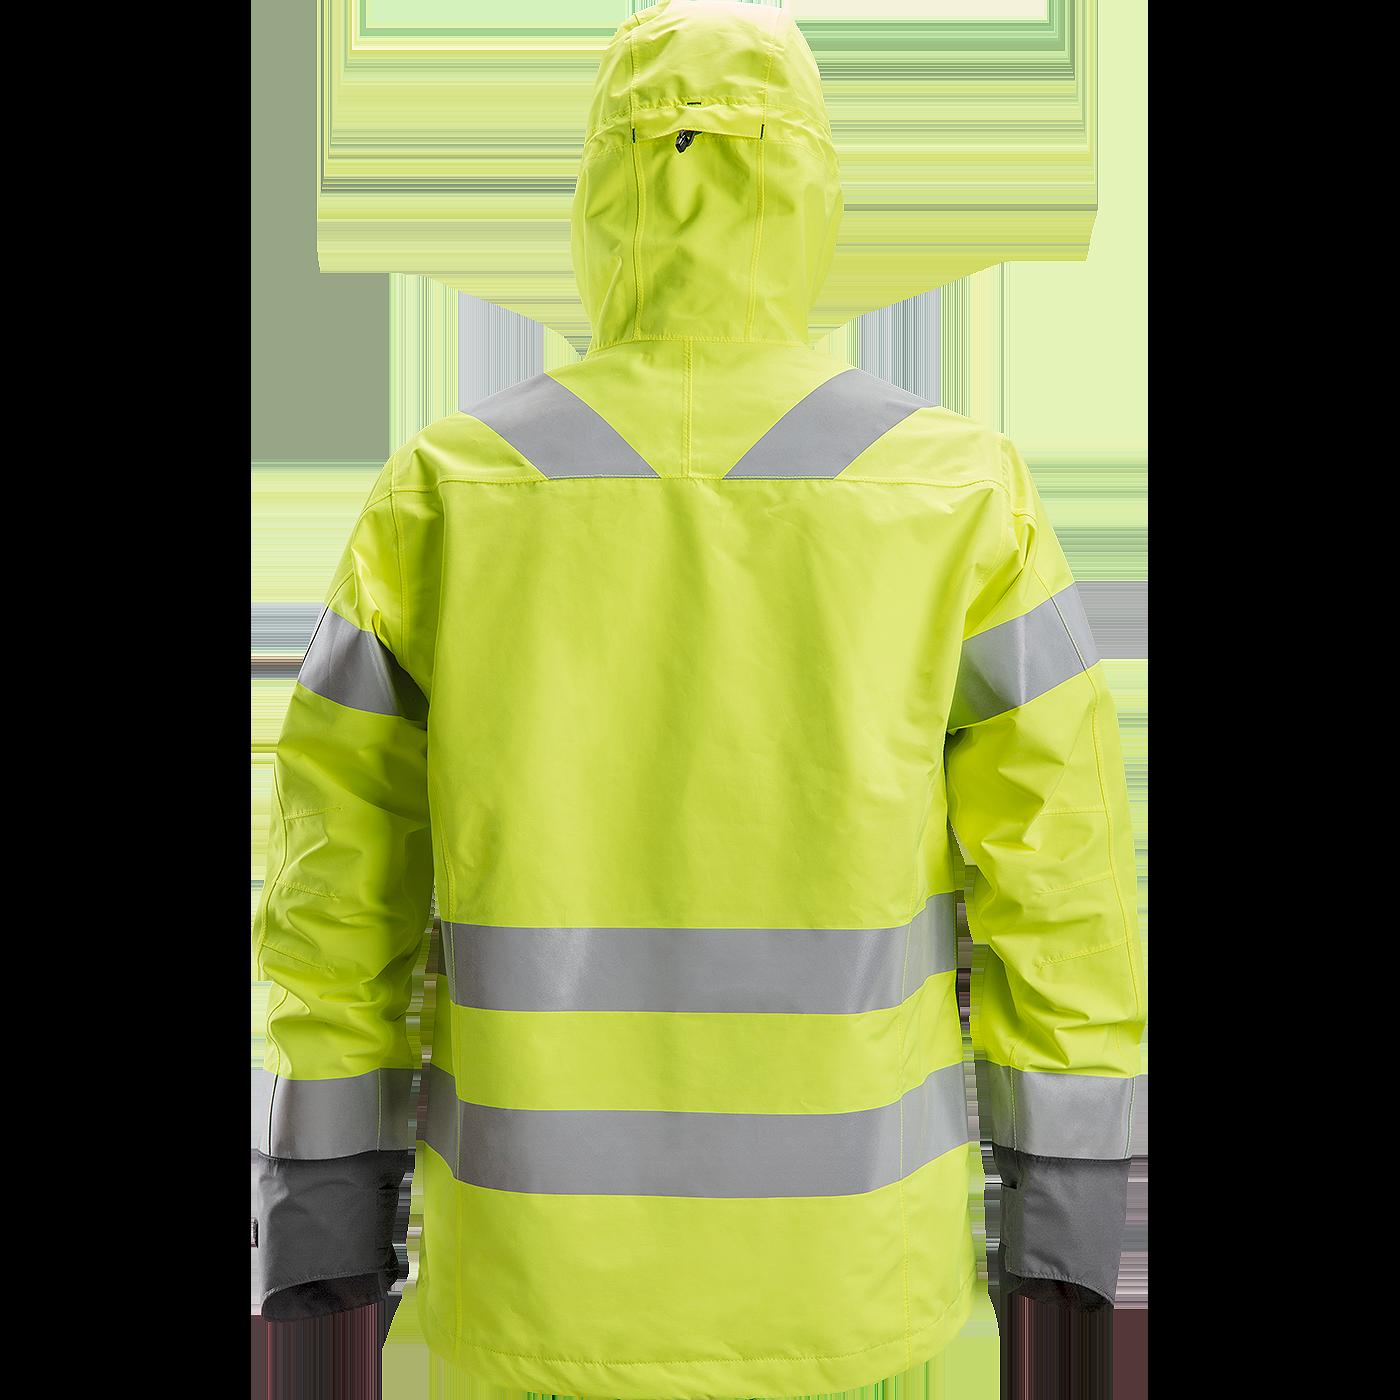 SNICKERS Workwear FlexiWork Softshell elastīgas bikses ar nokarenām kabatām